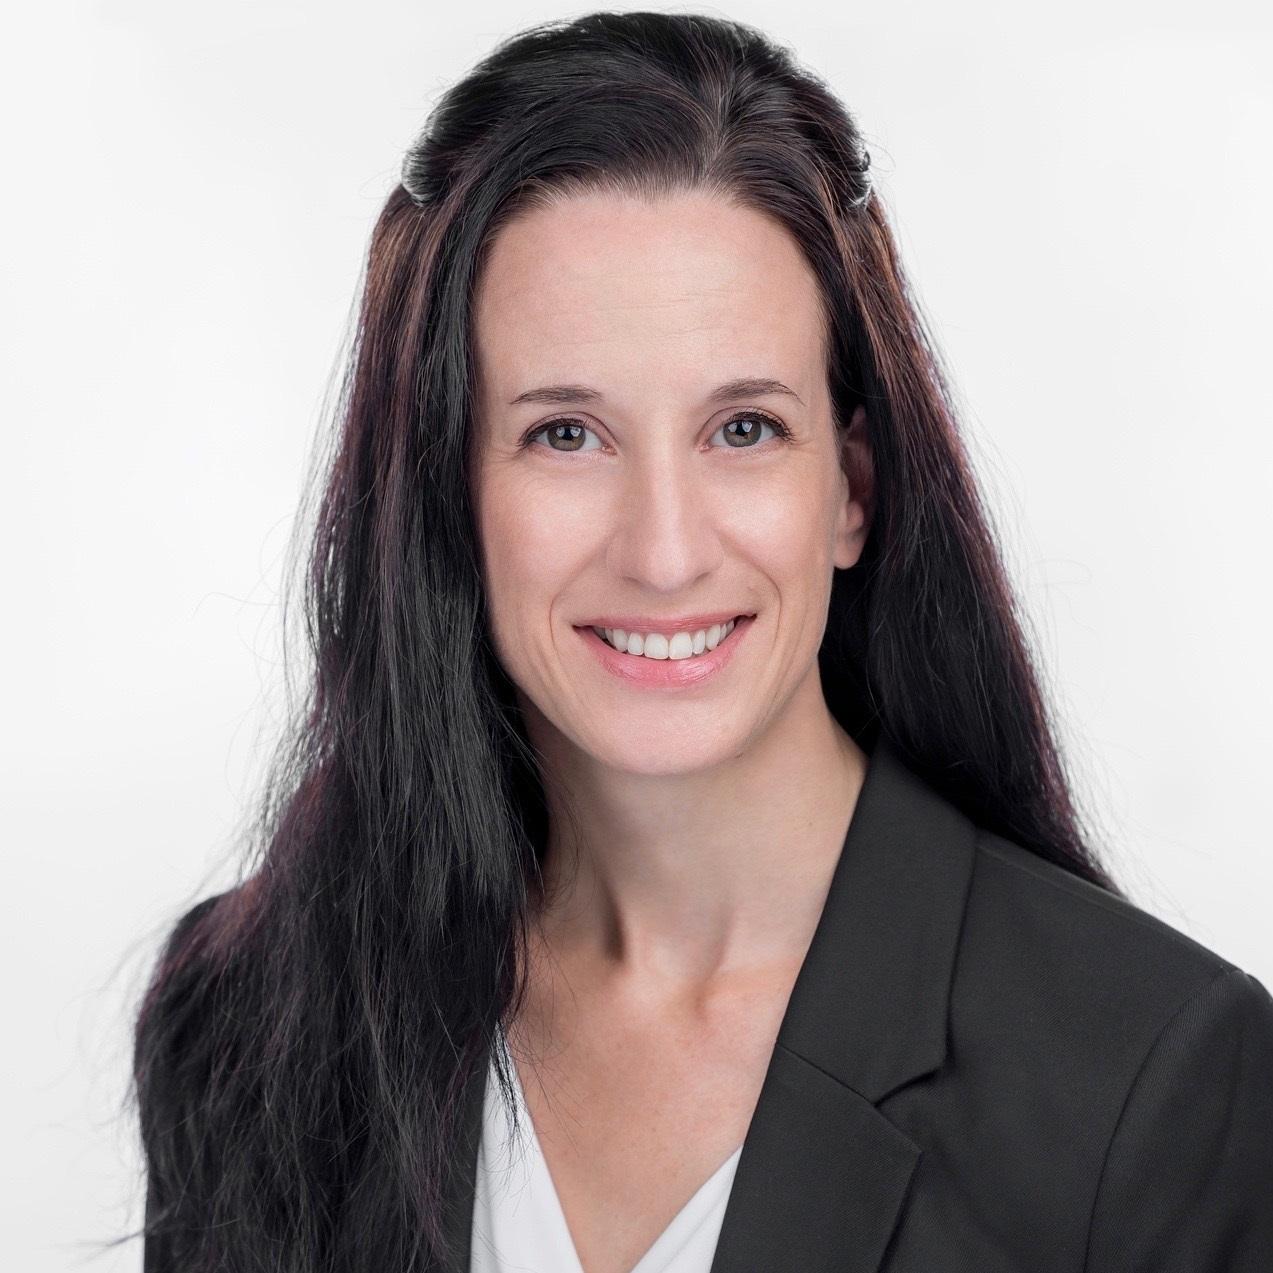 Julie Ridgway